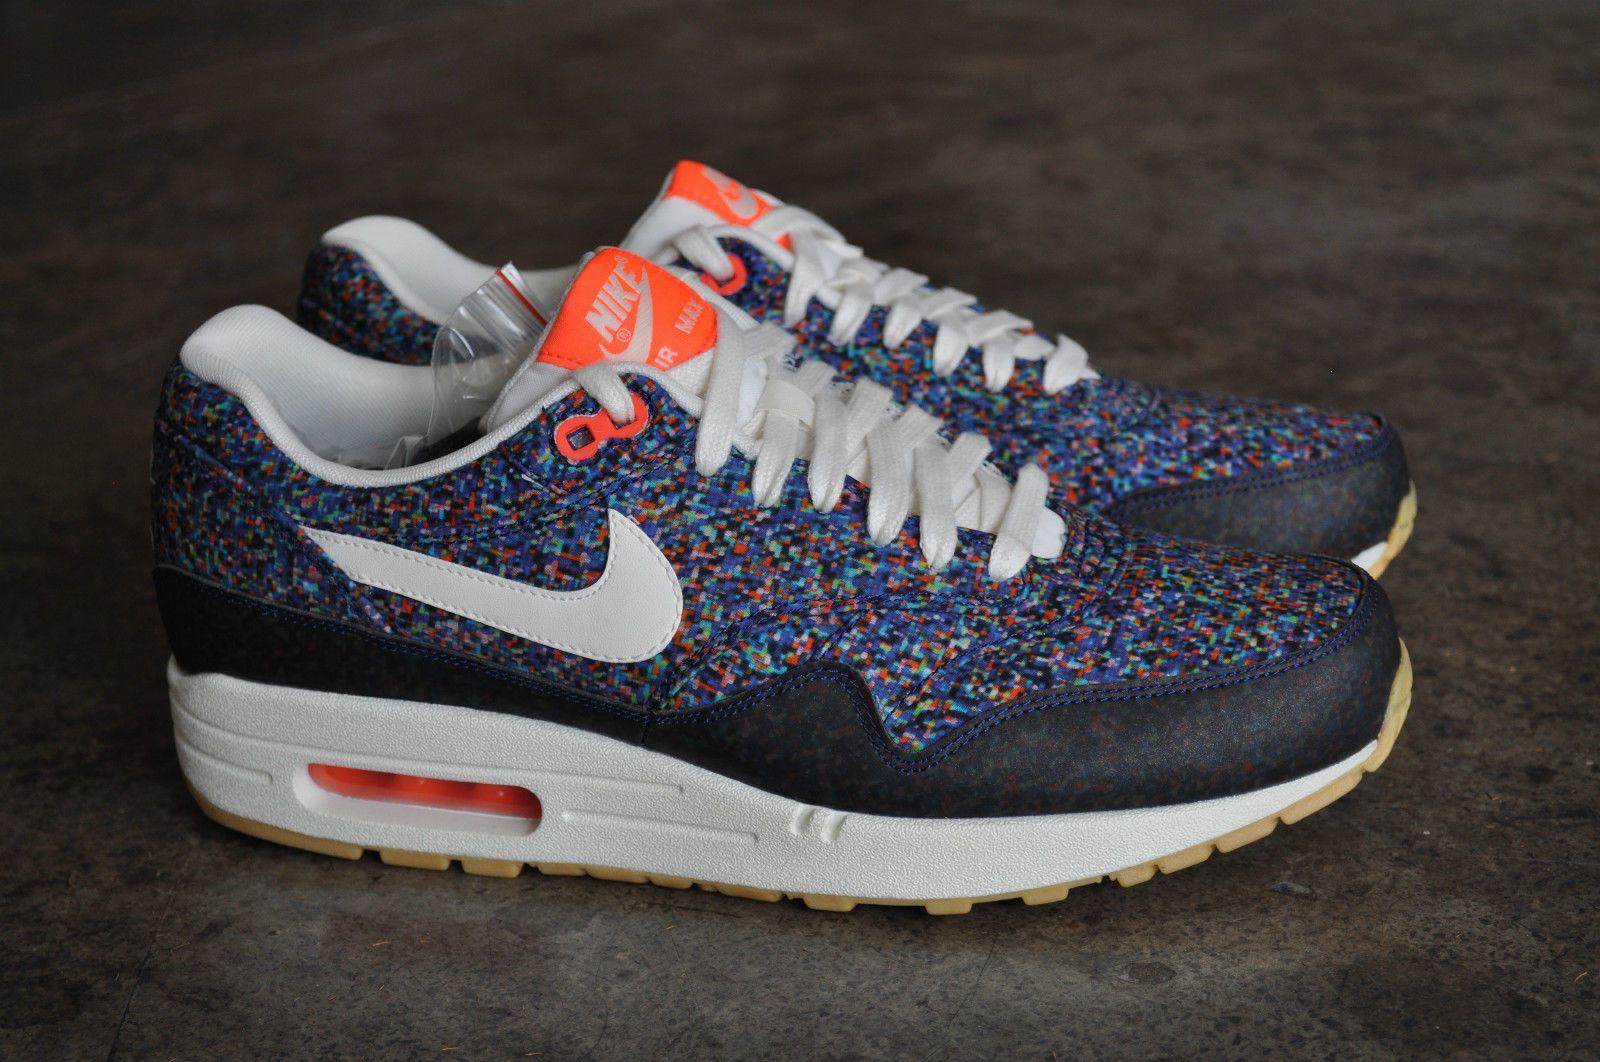 Nike Air Max 1 Liberty of London Pixel Running Shoes 528712 400